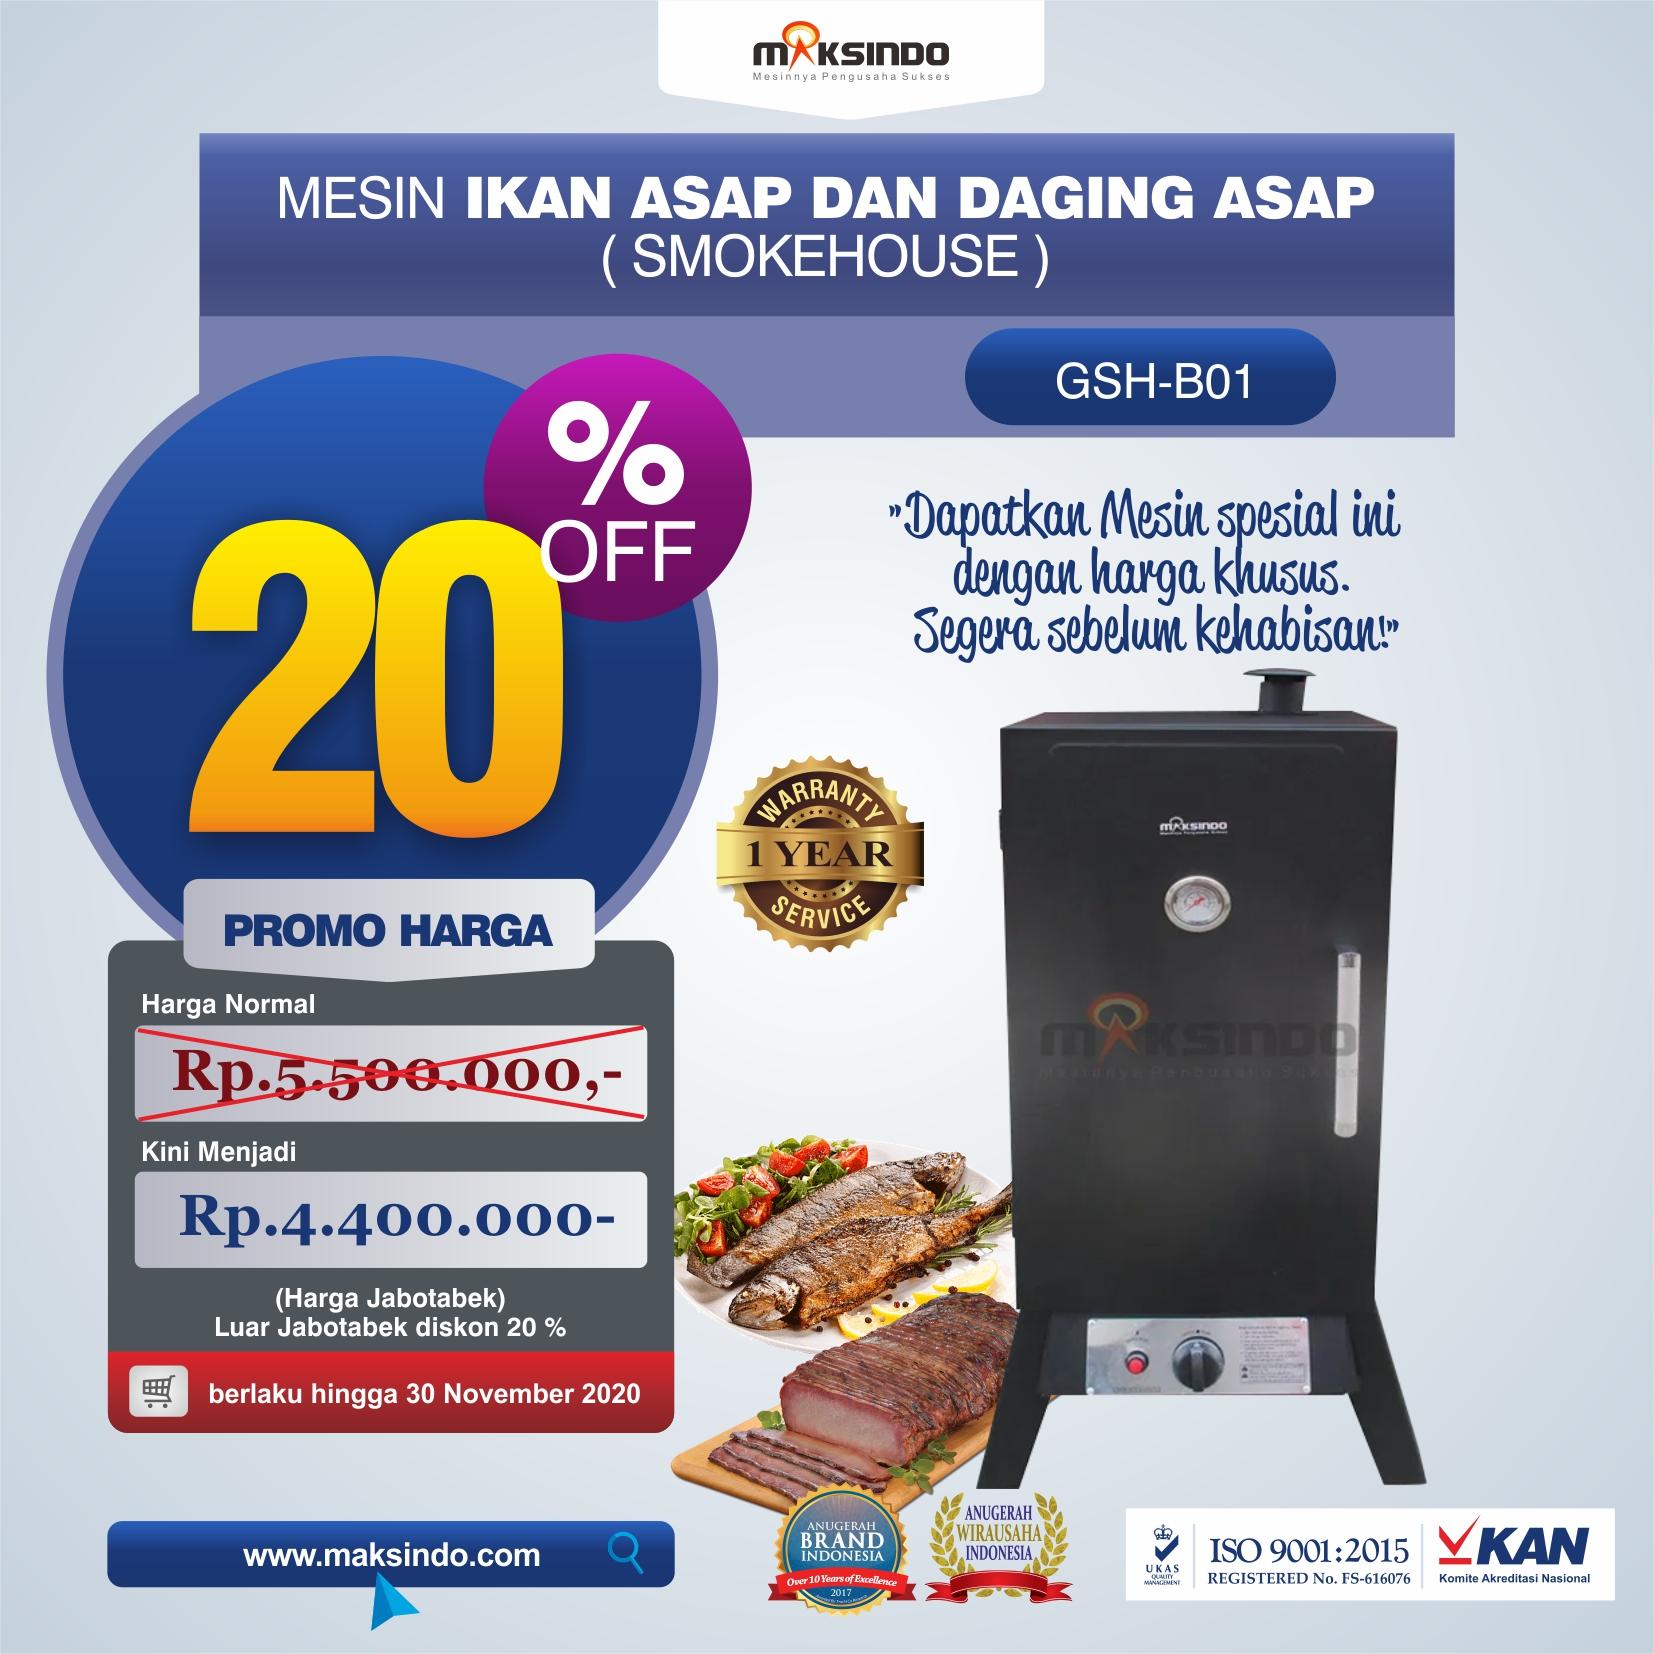 Jual Mesin Ikan Asap dan Daging Asap (Smokehouse) GSH-B01 Di Medan